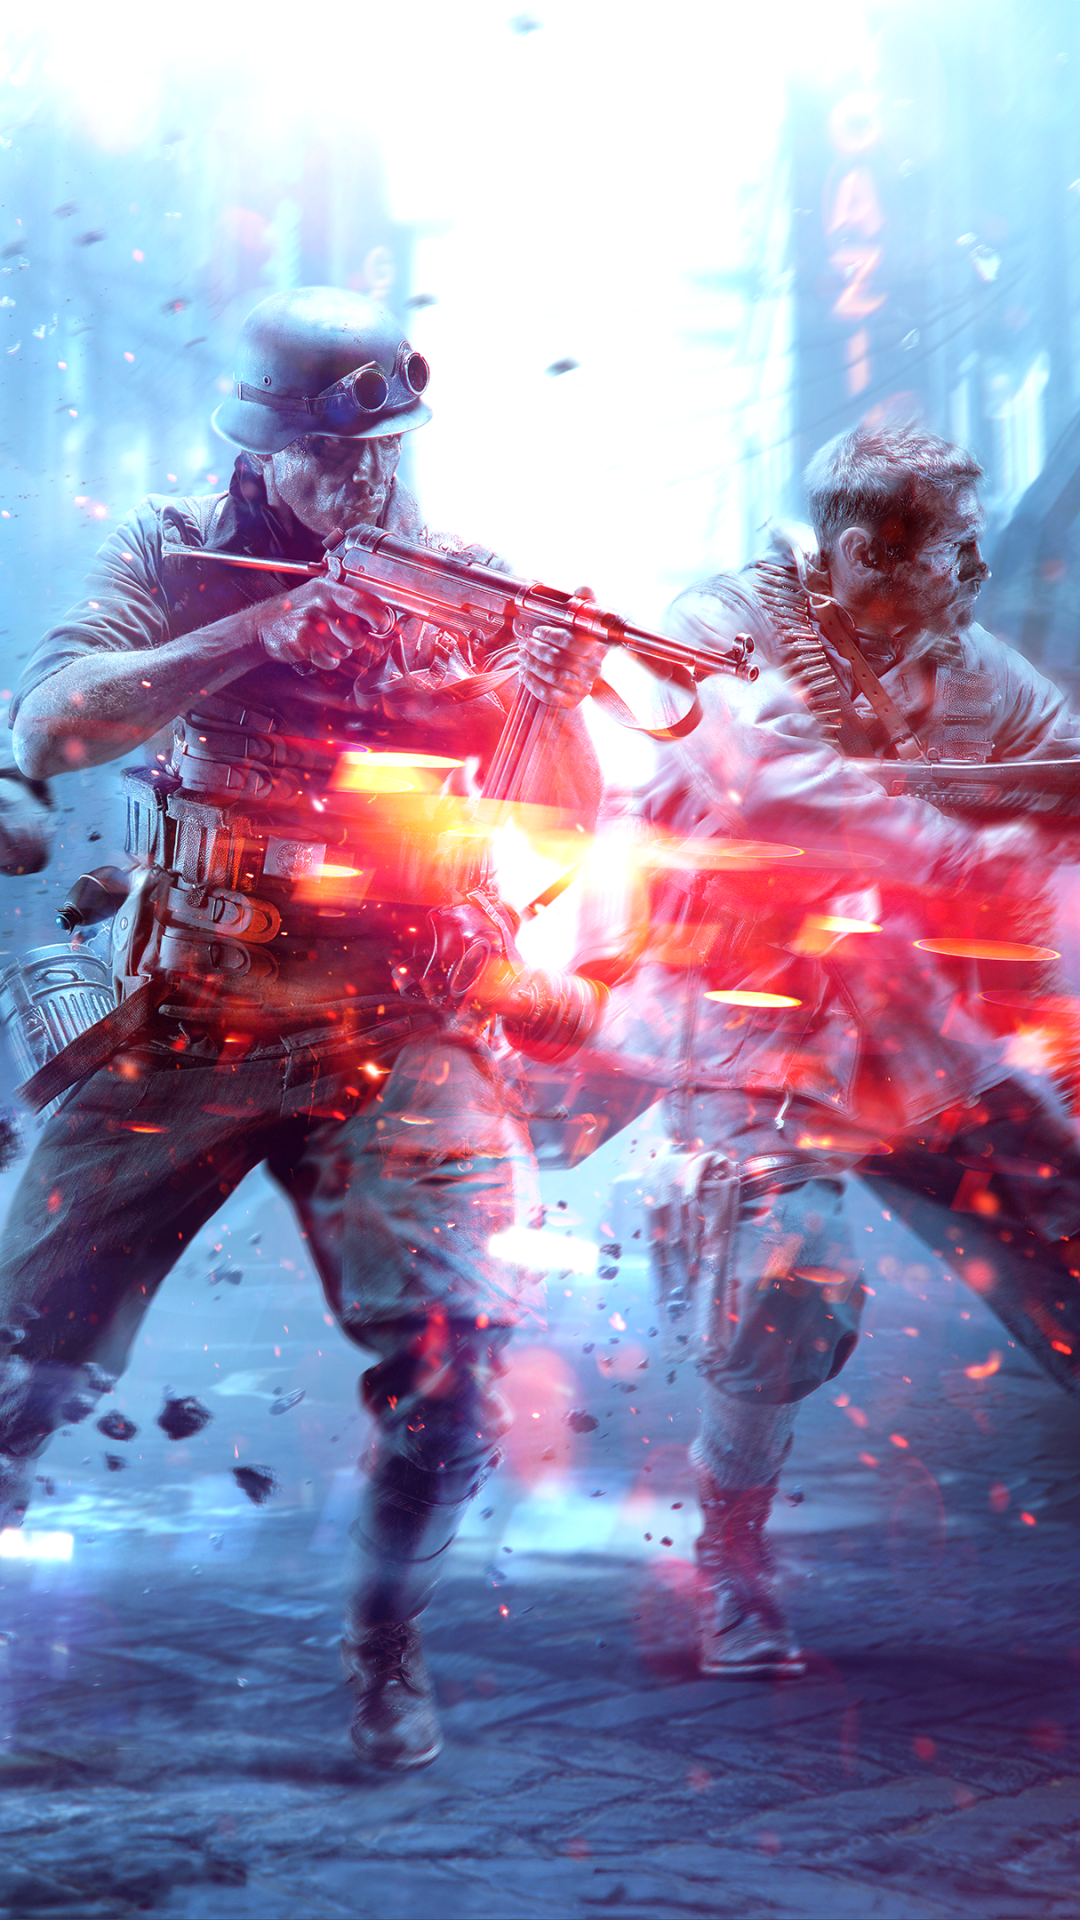 Video Game / Battlefield V (1080x1920) Mobile Wallpaper